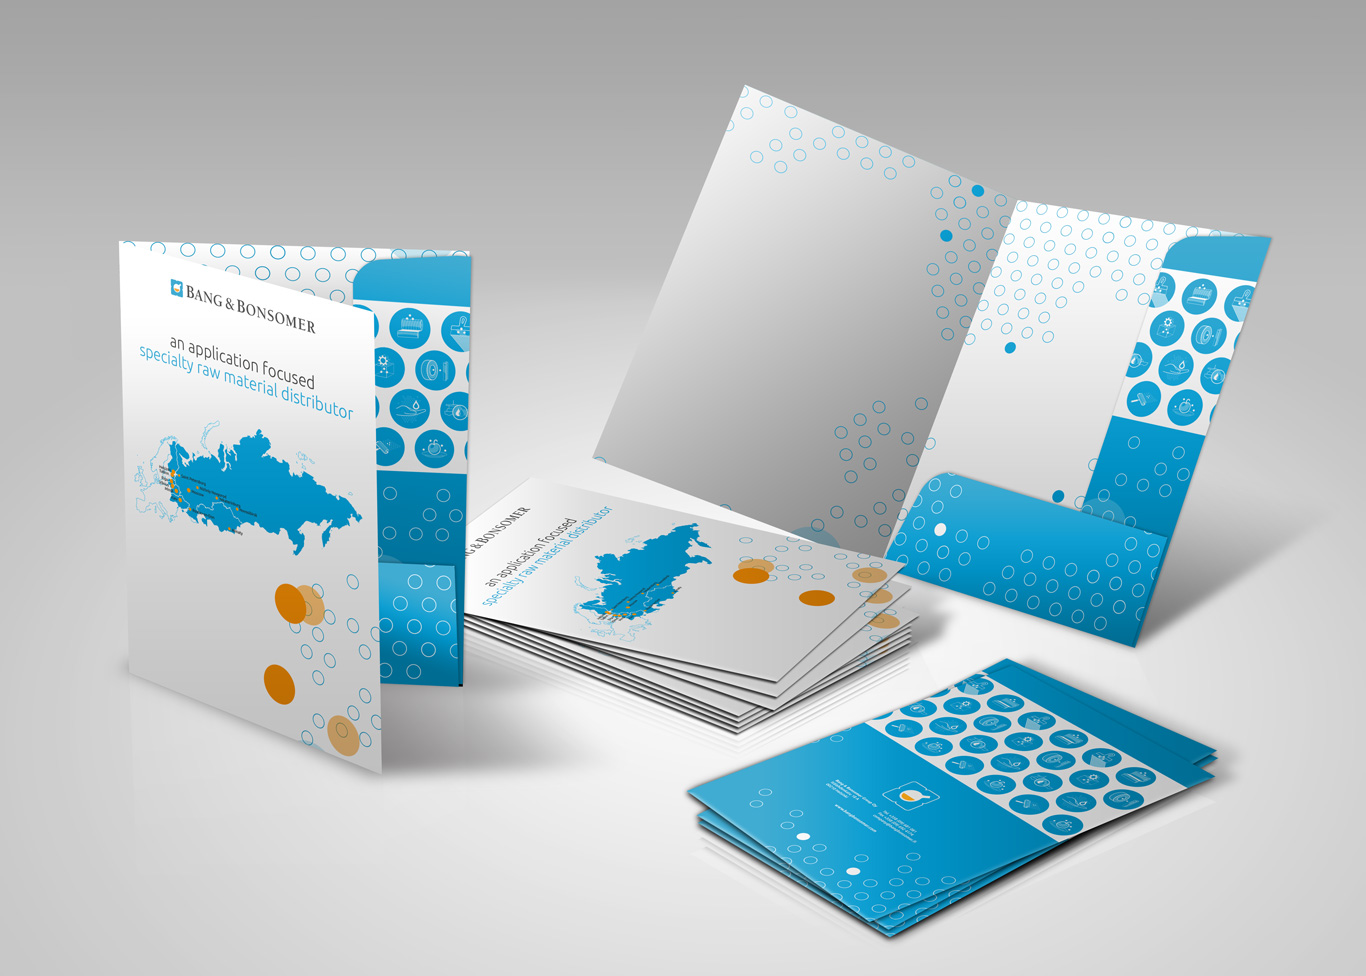 bangbonsomer-A4-Document-Folder-Mockup-V2